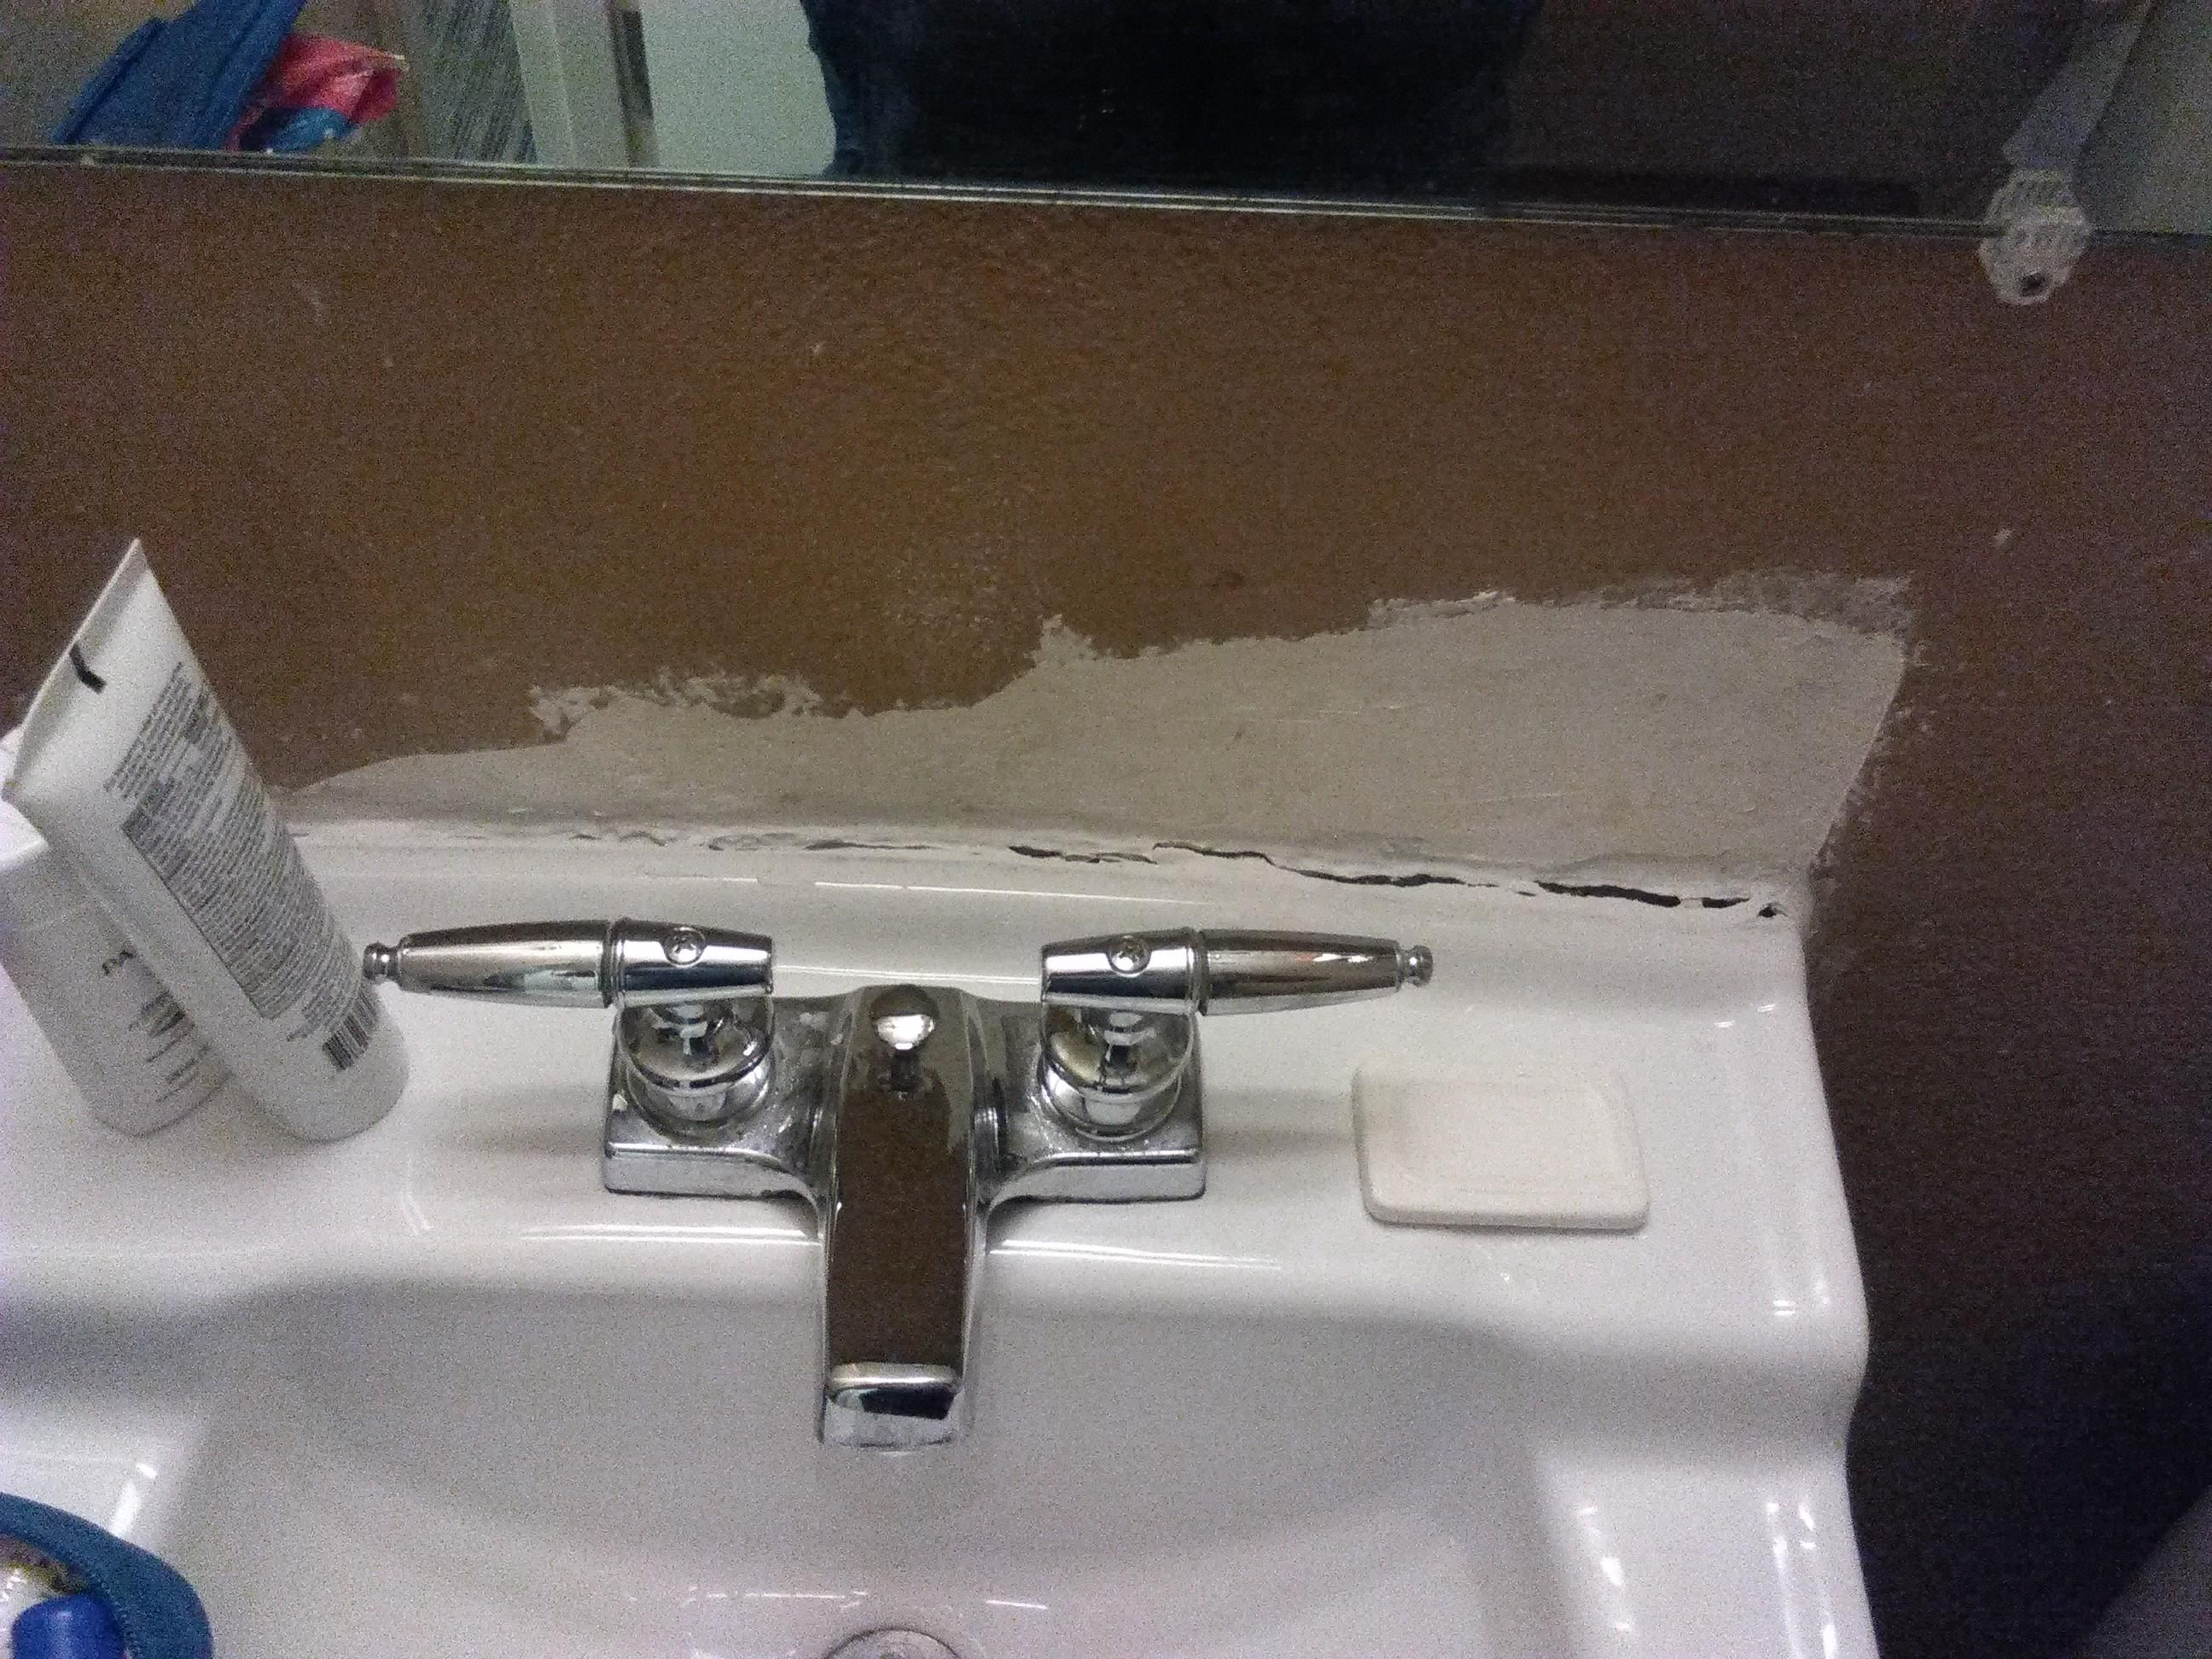 Crackedb sink